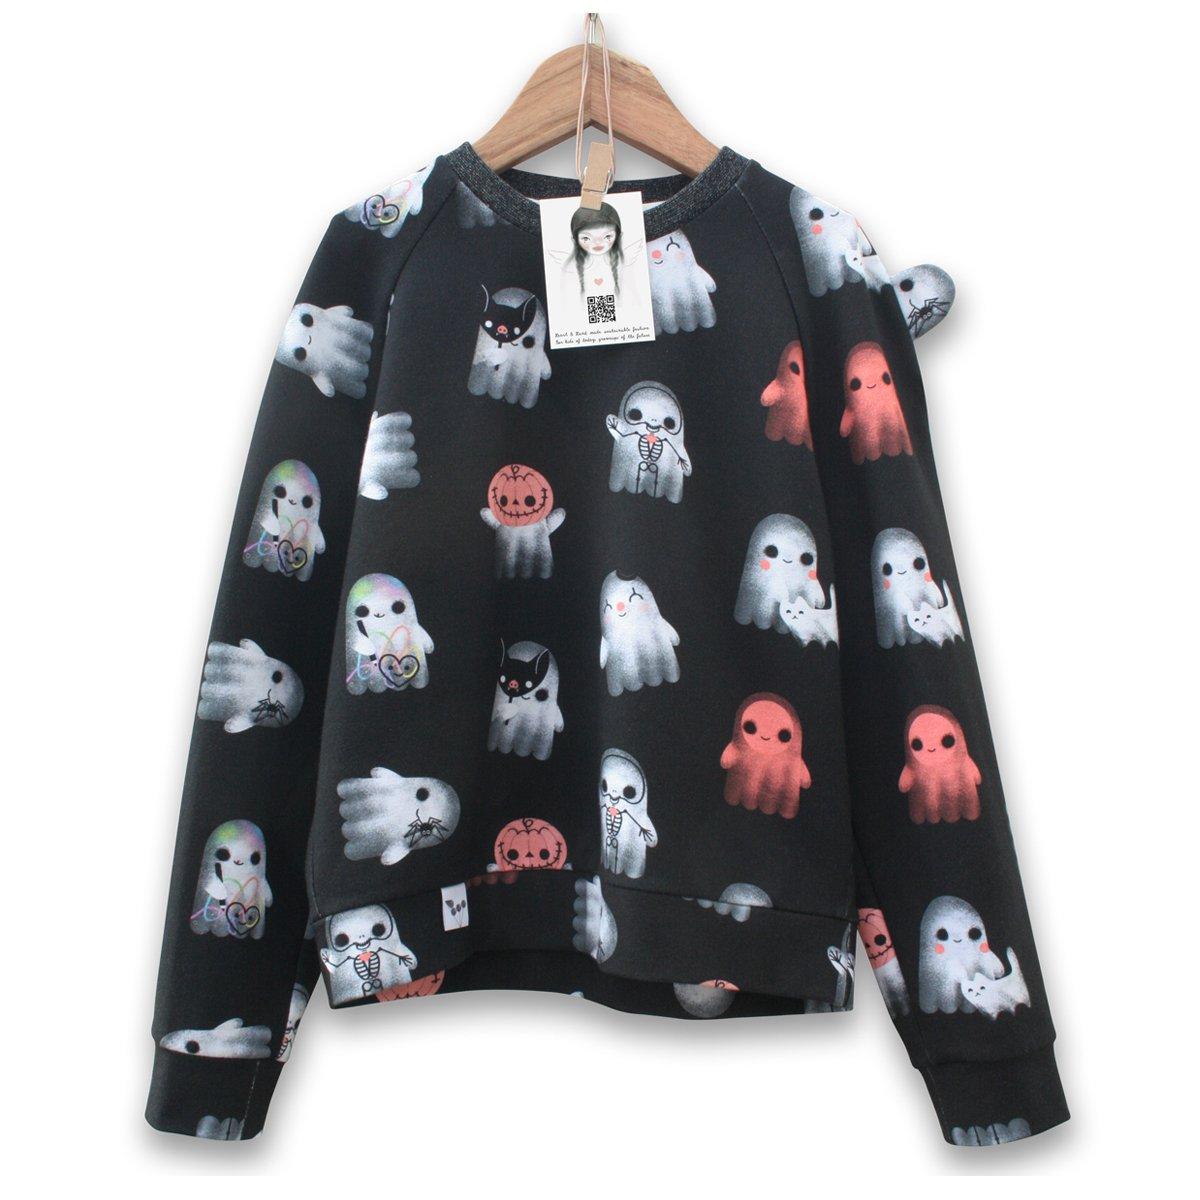 Image of Lill' Ghosts unisex kids sweatshirt